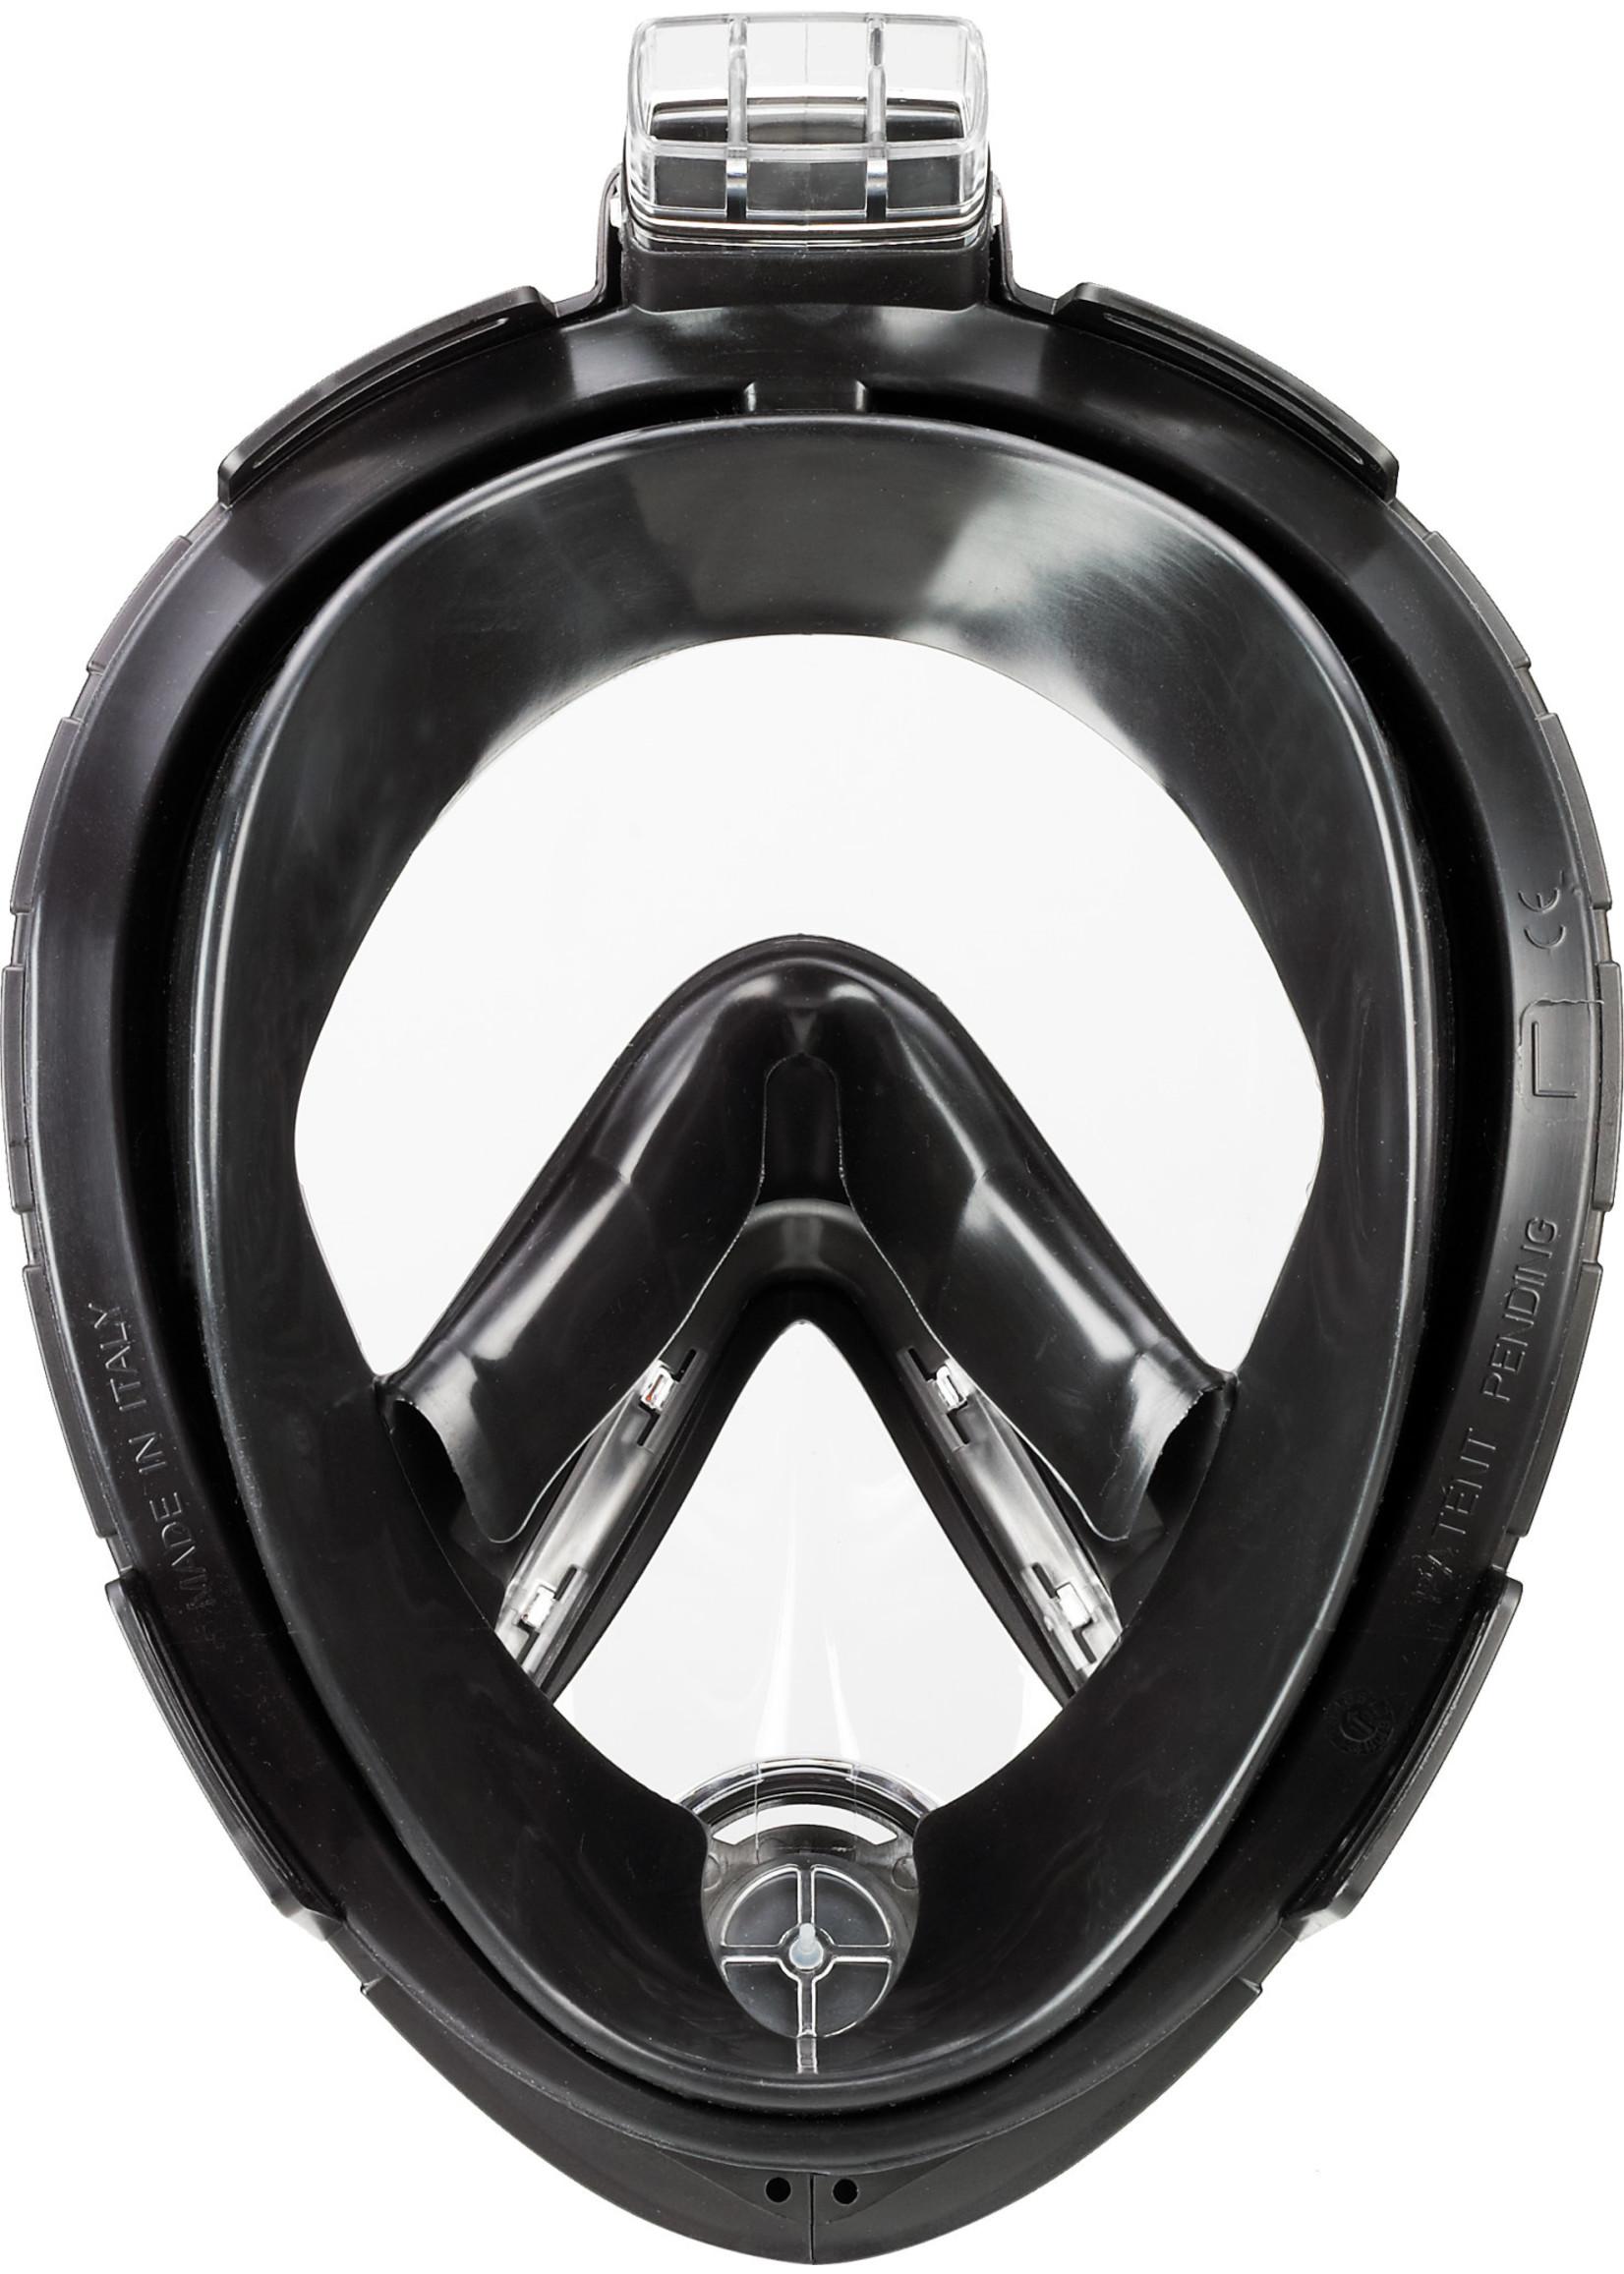 TUSA Full-Face Snorkeling Mask - Black